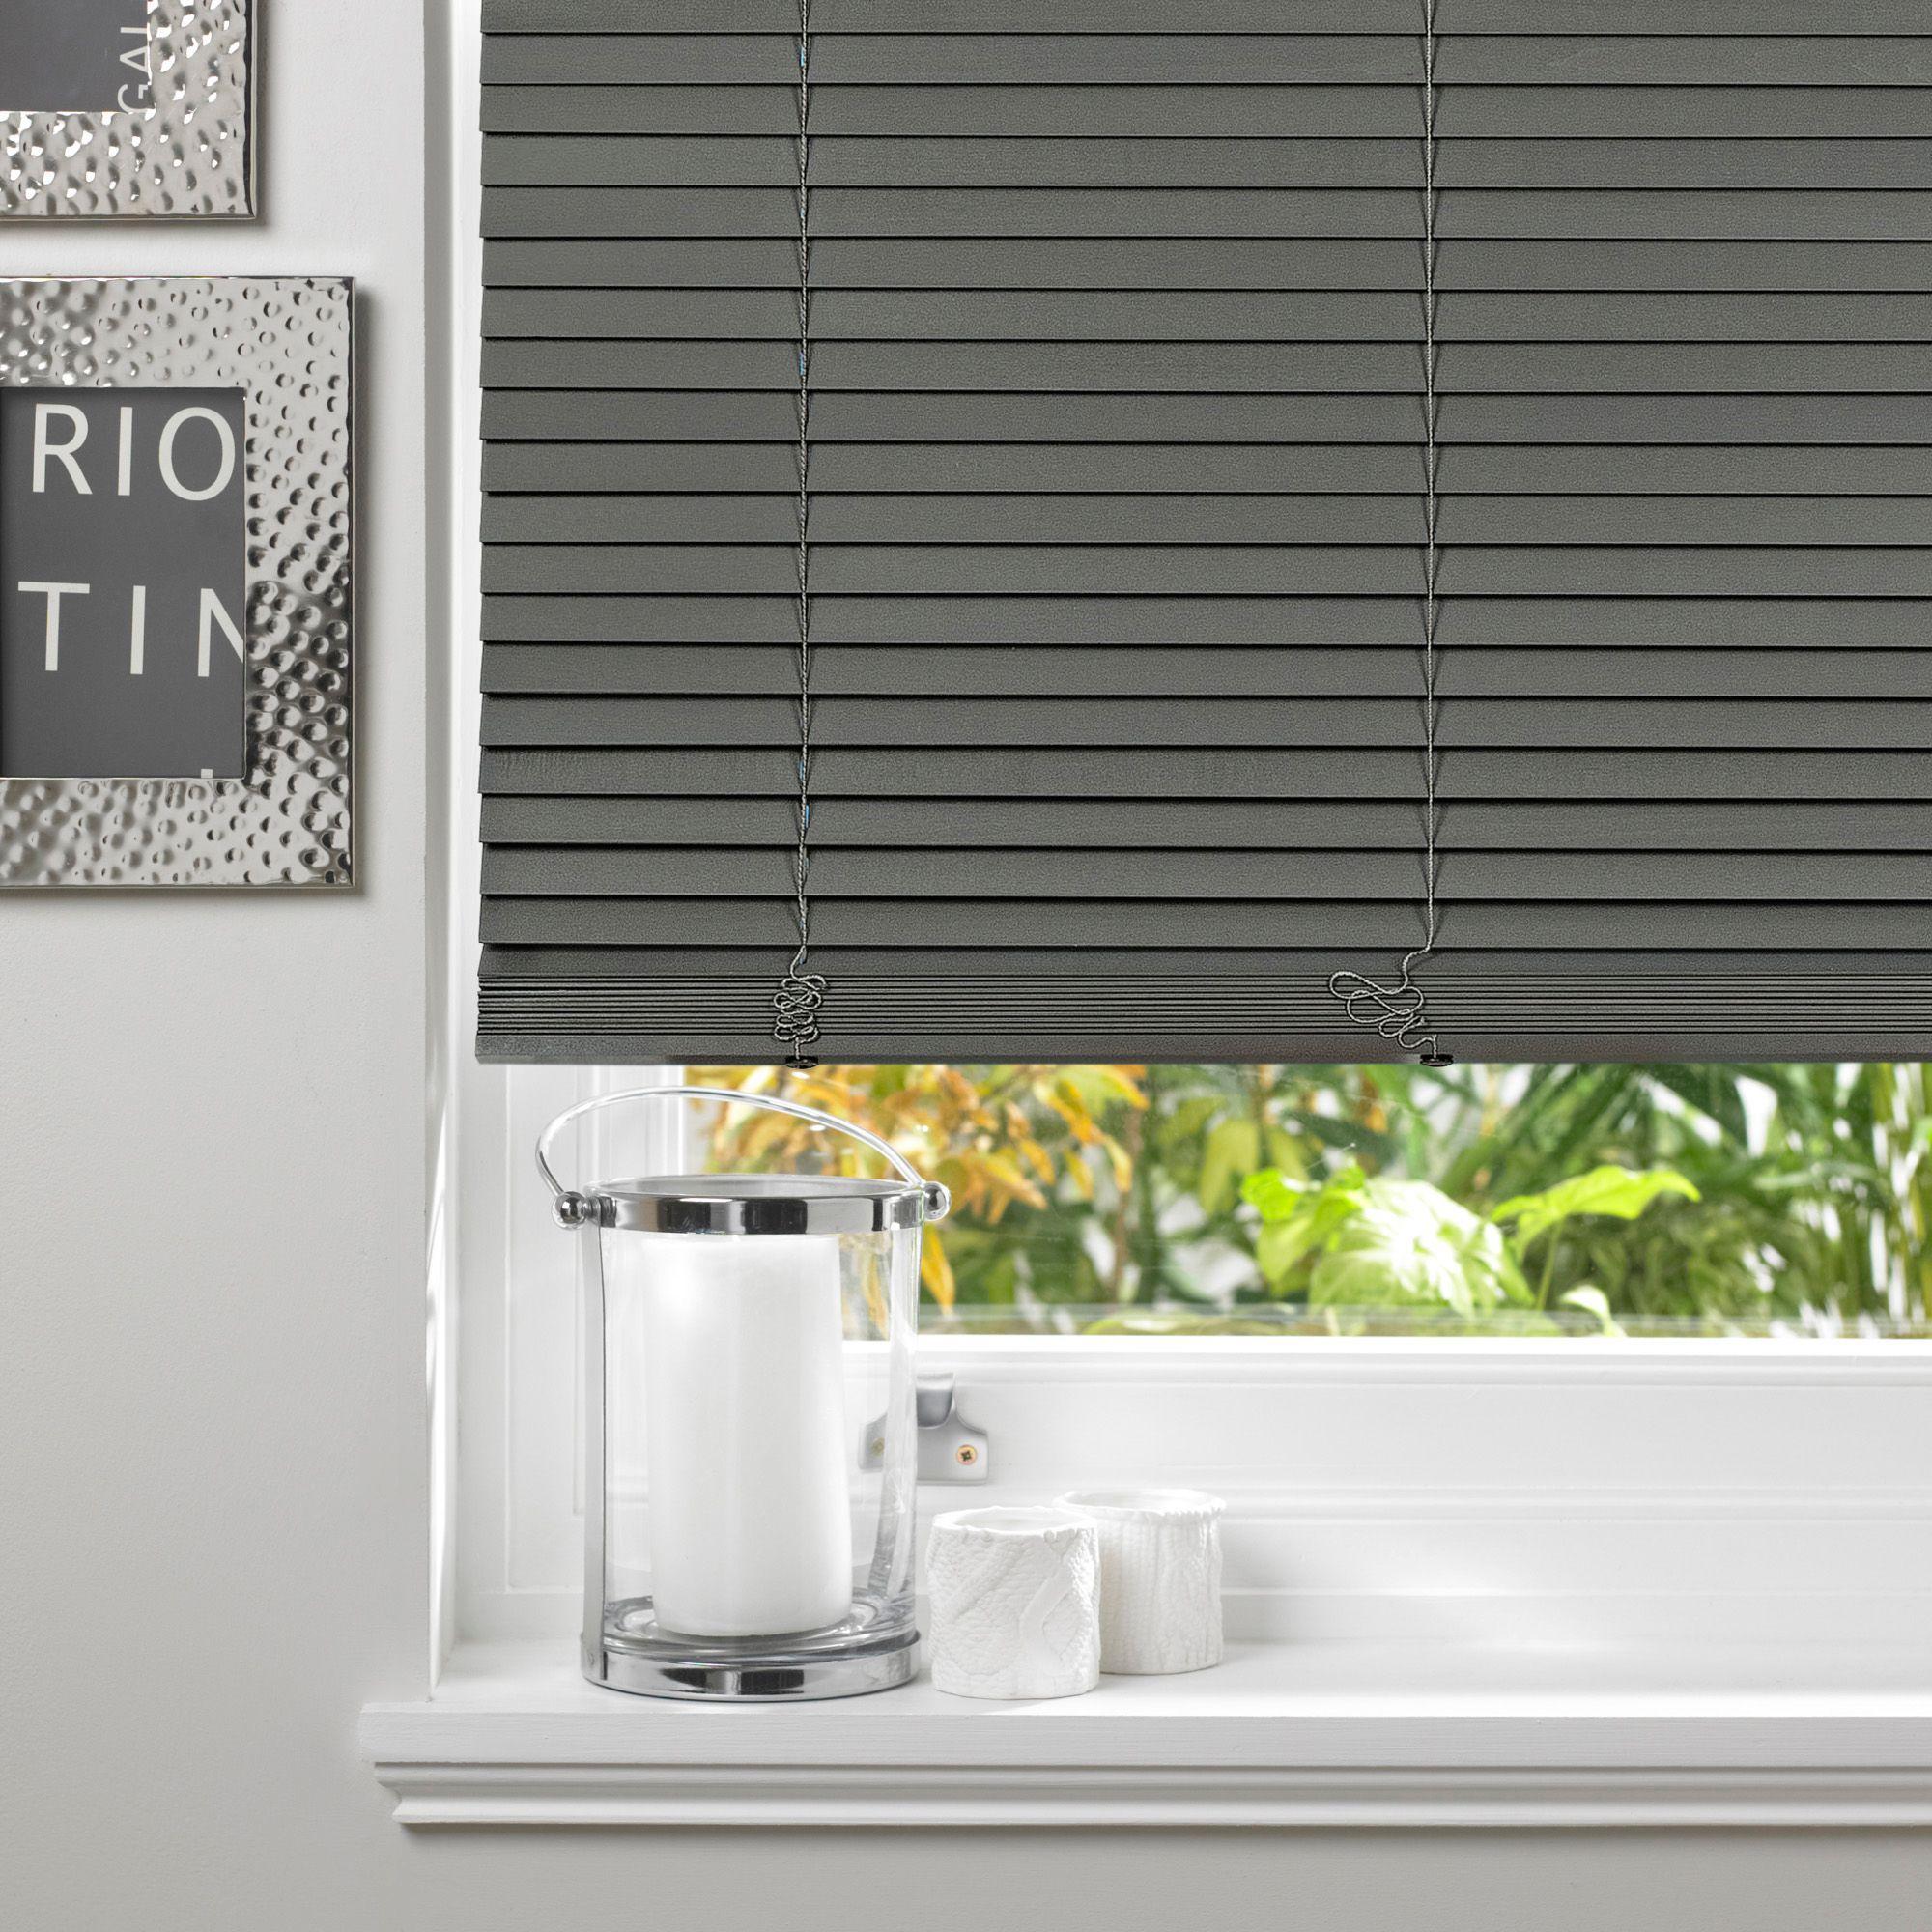 Bathroom Window Blinds B&Q colours marco grey venetian blind (w)60 cm (l)160 cm | departments